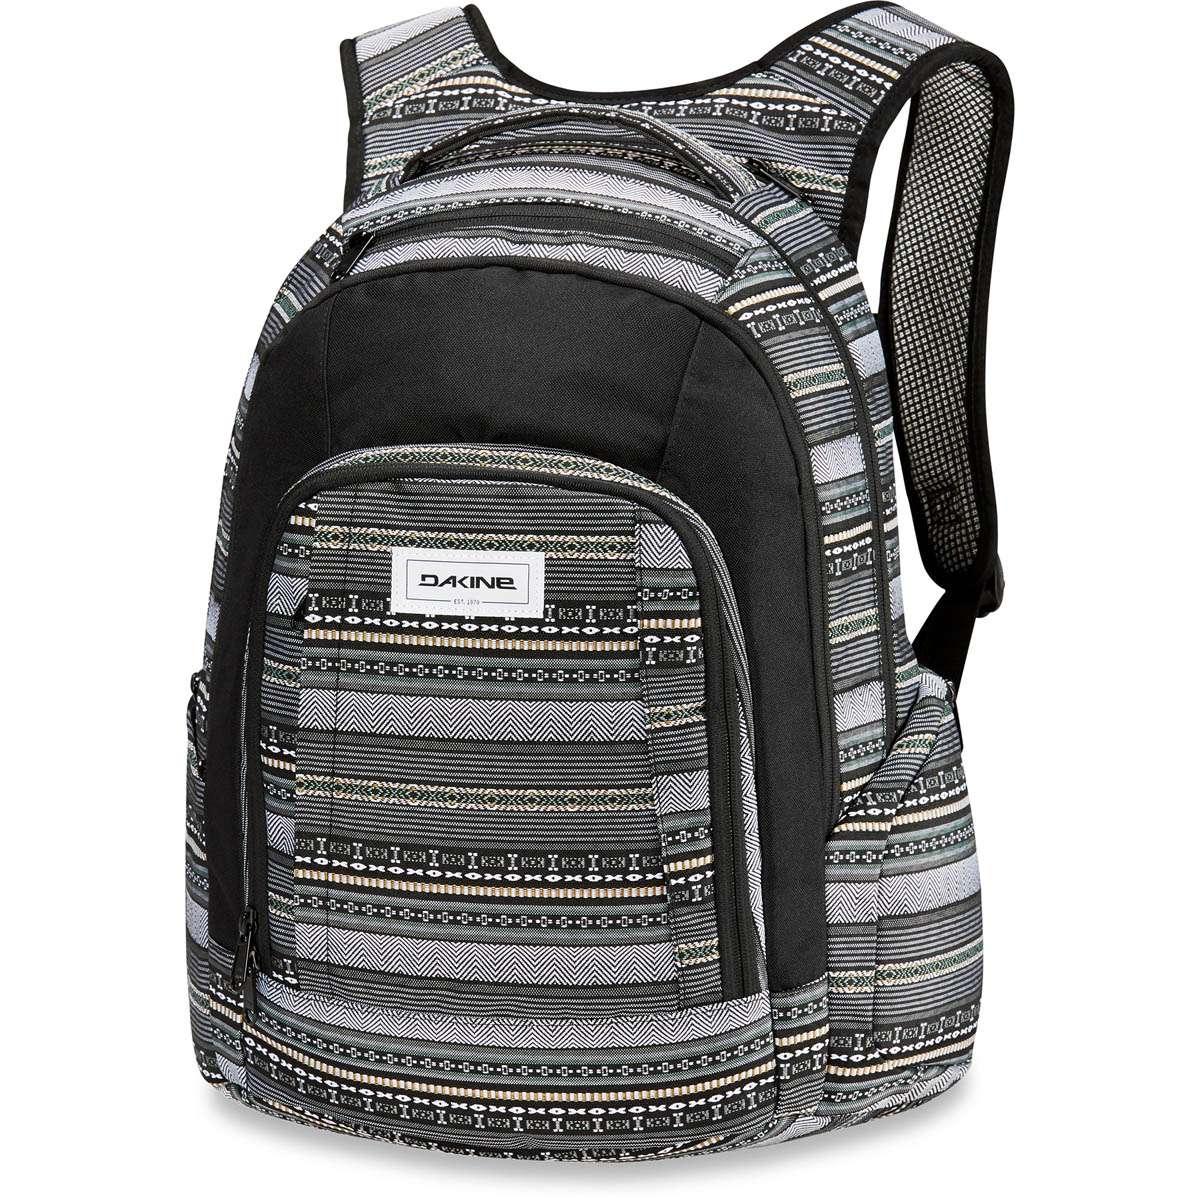 a015bd790a042 Dakine Frankie 26L Backpack Zion